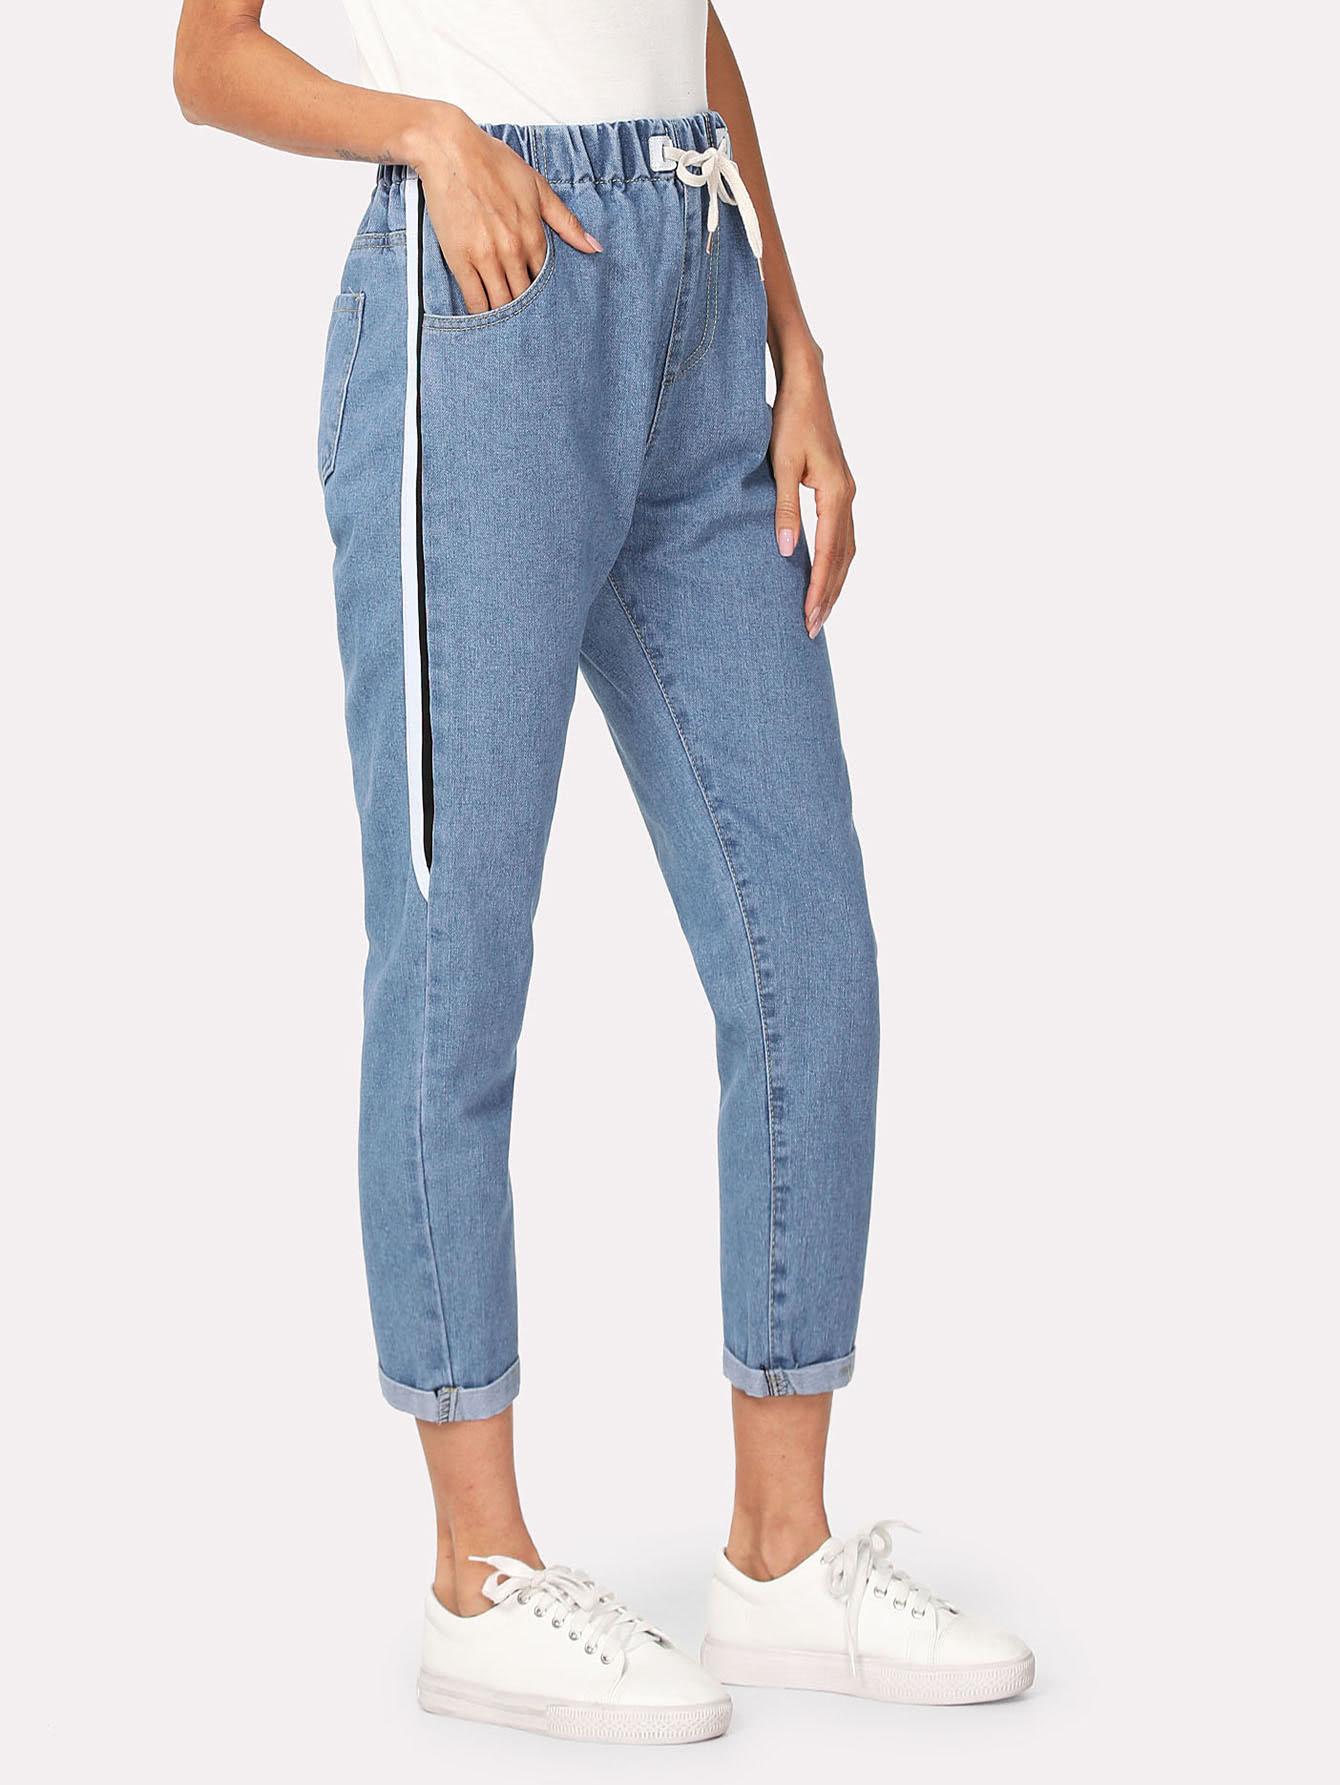 Drawstring Waist Roll Up Hem Jeans